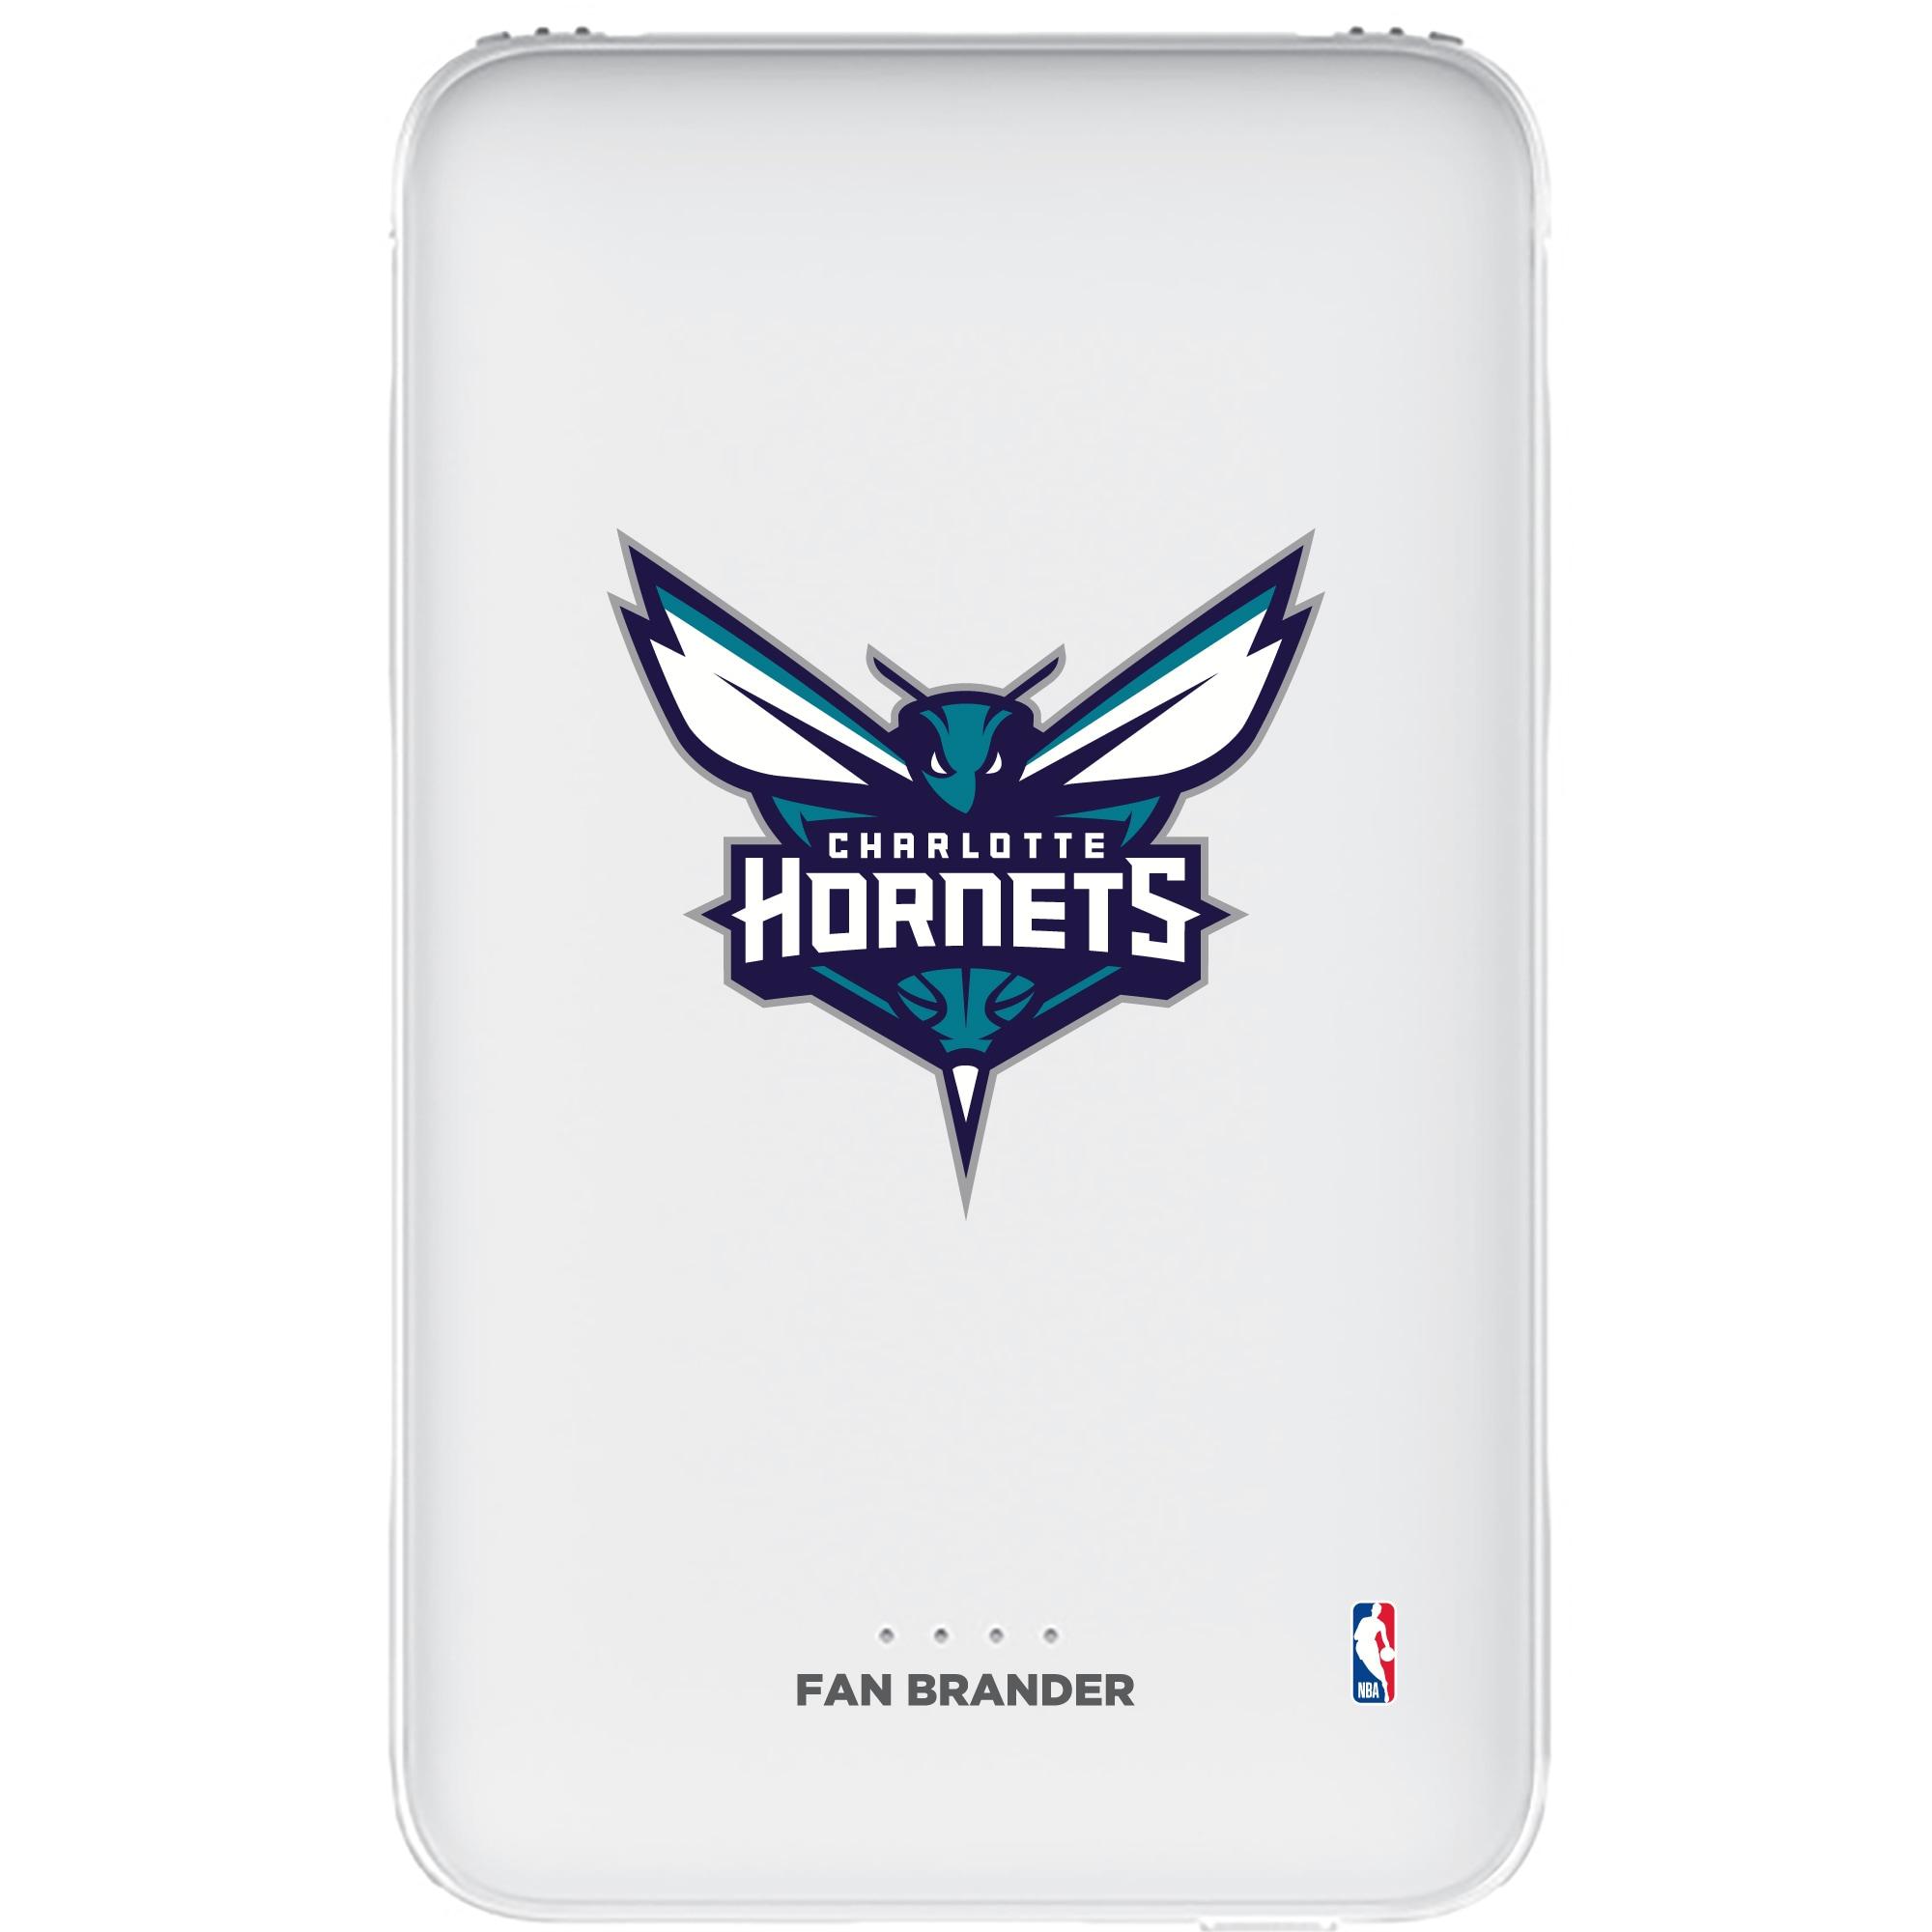 Charlotte Hornets 5000mAh Portable Power Bank - White